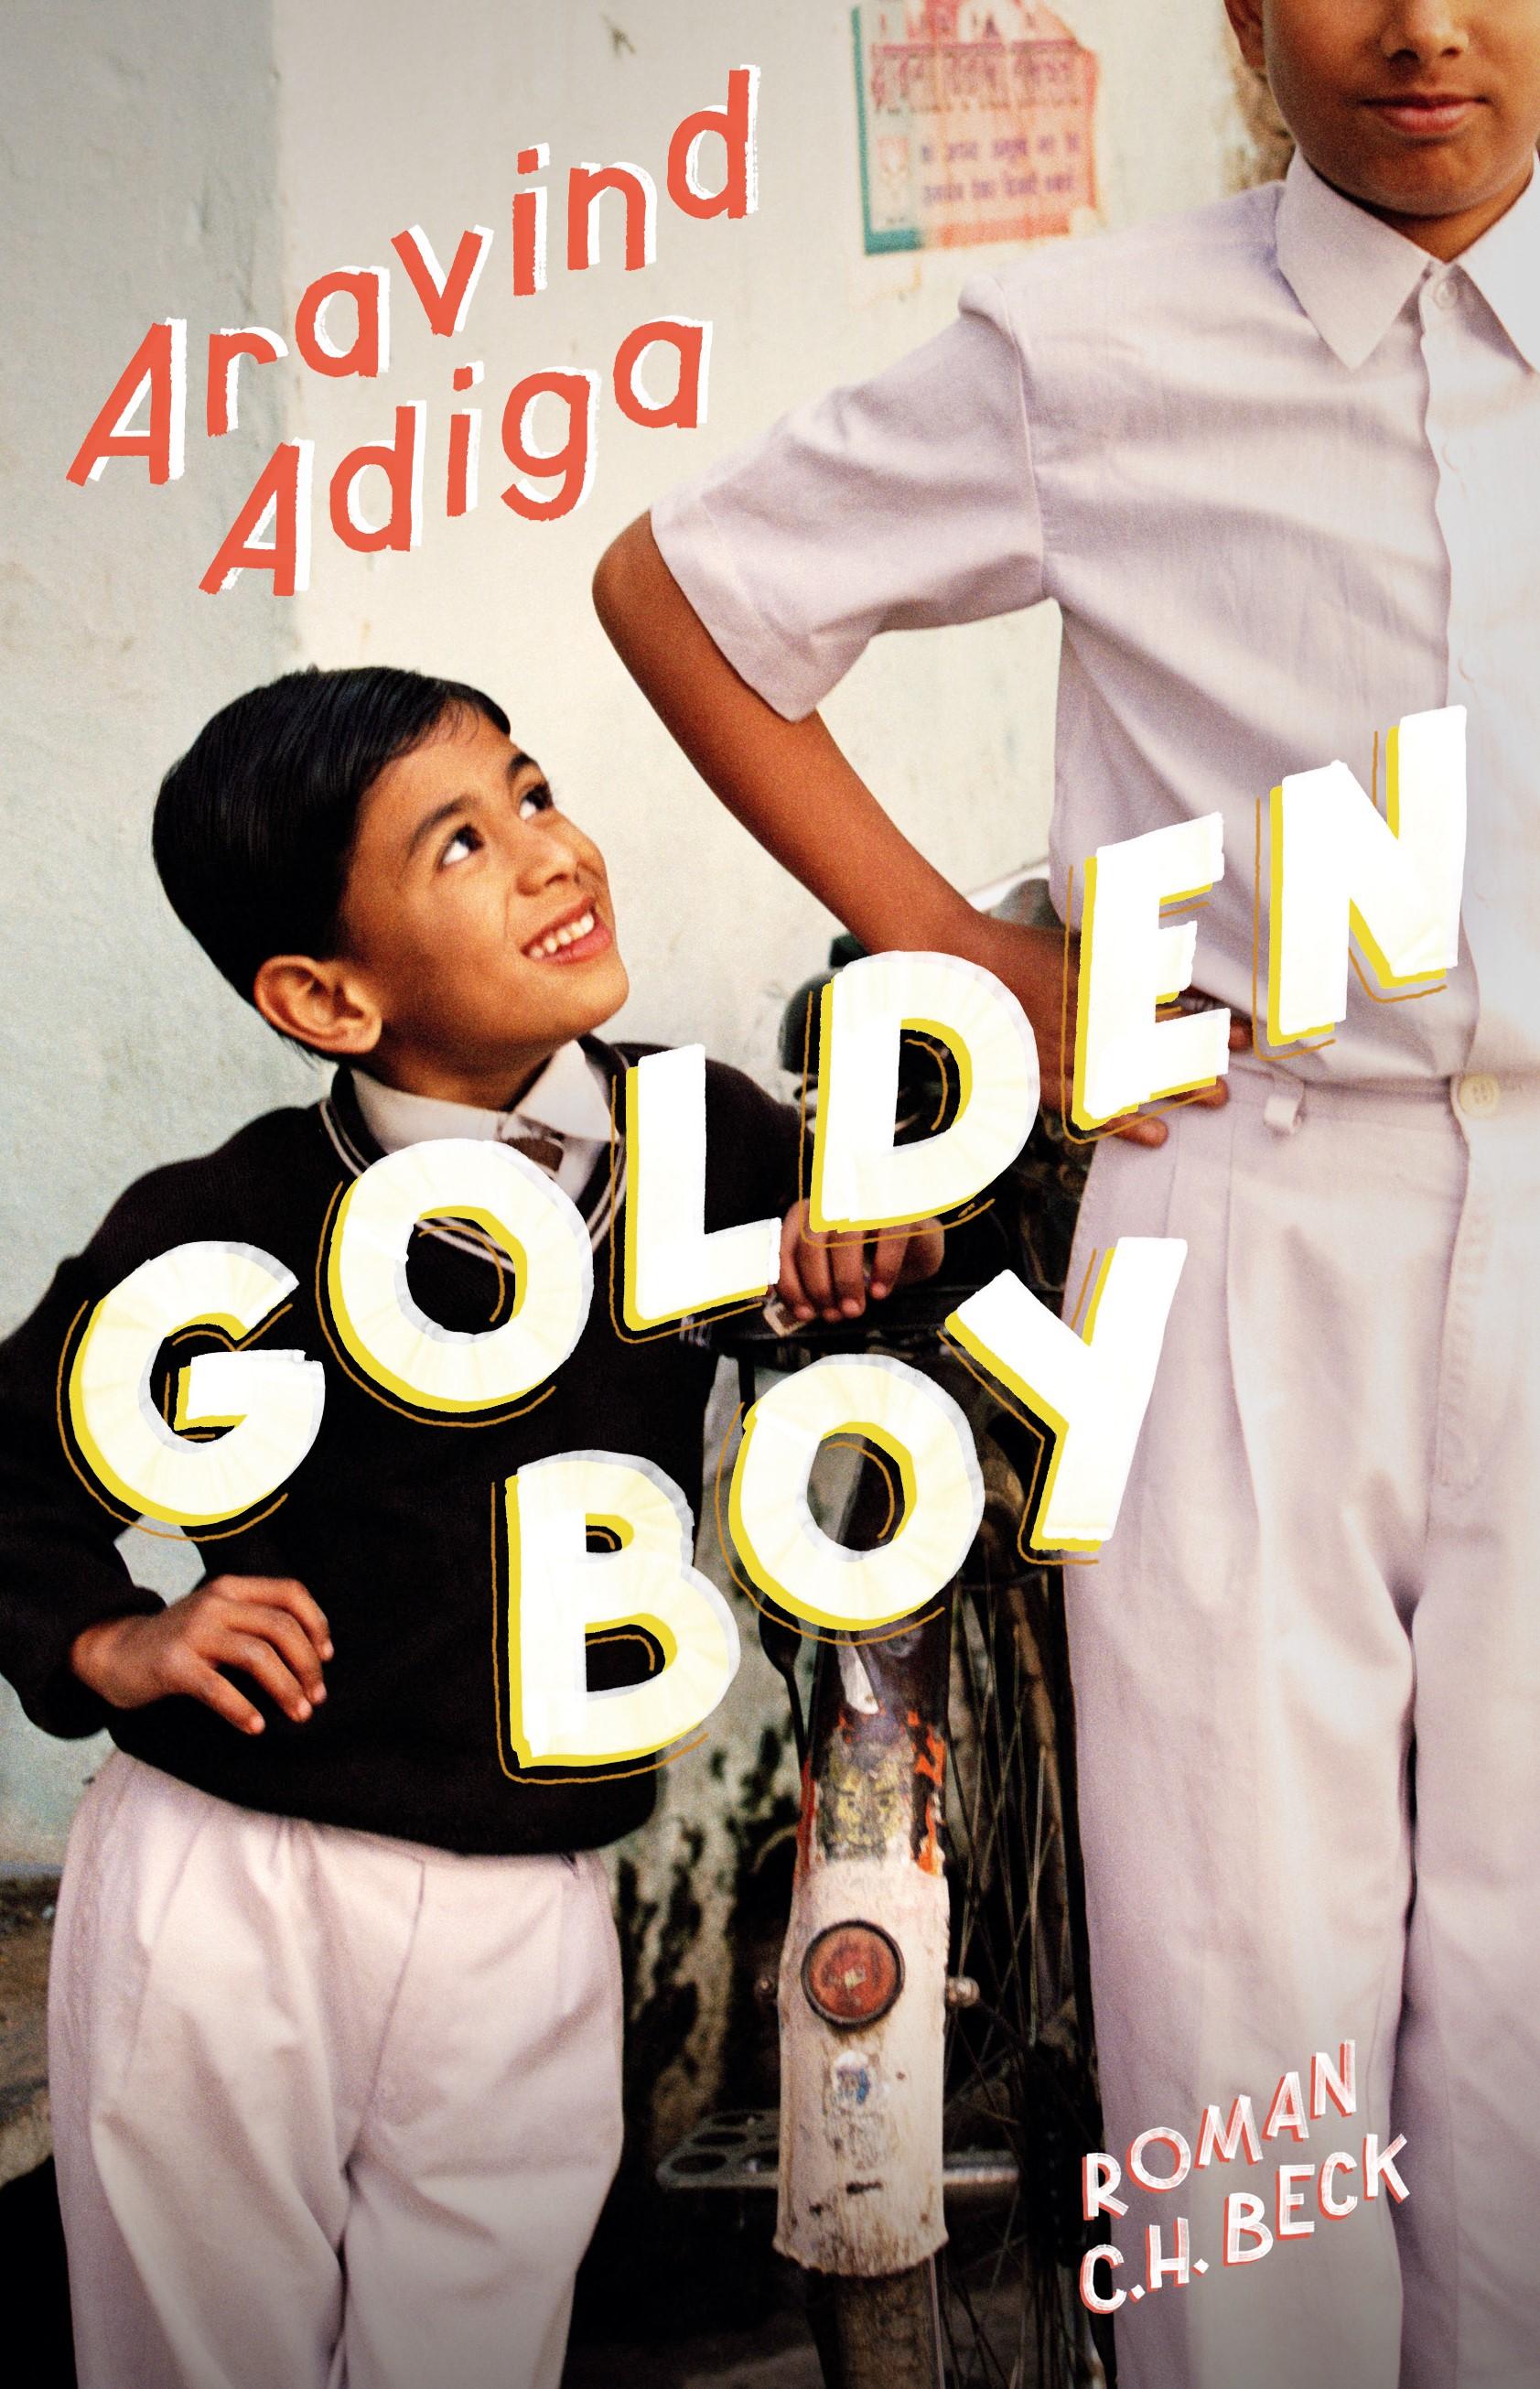 Golden Boy | Adiga, Aravind, 2016 | Buch (Cover)